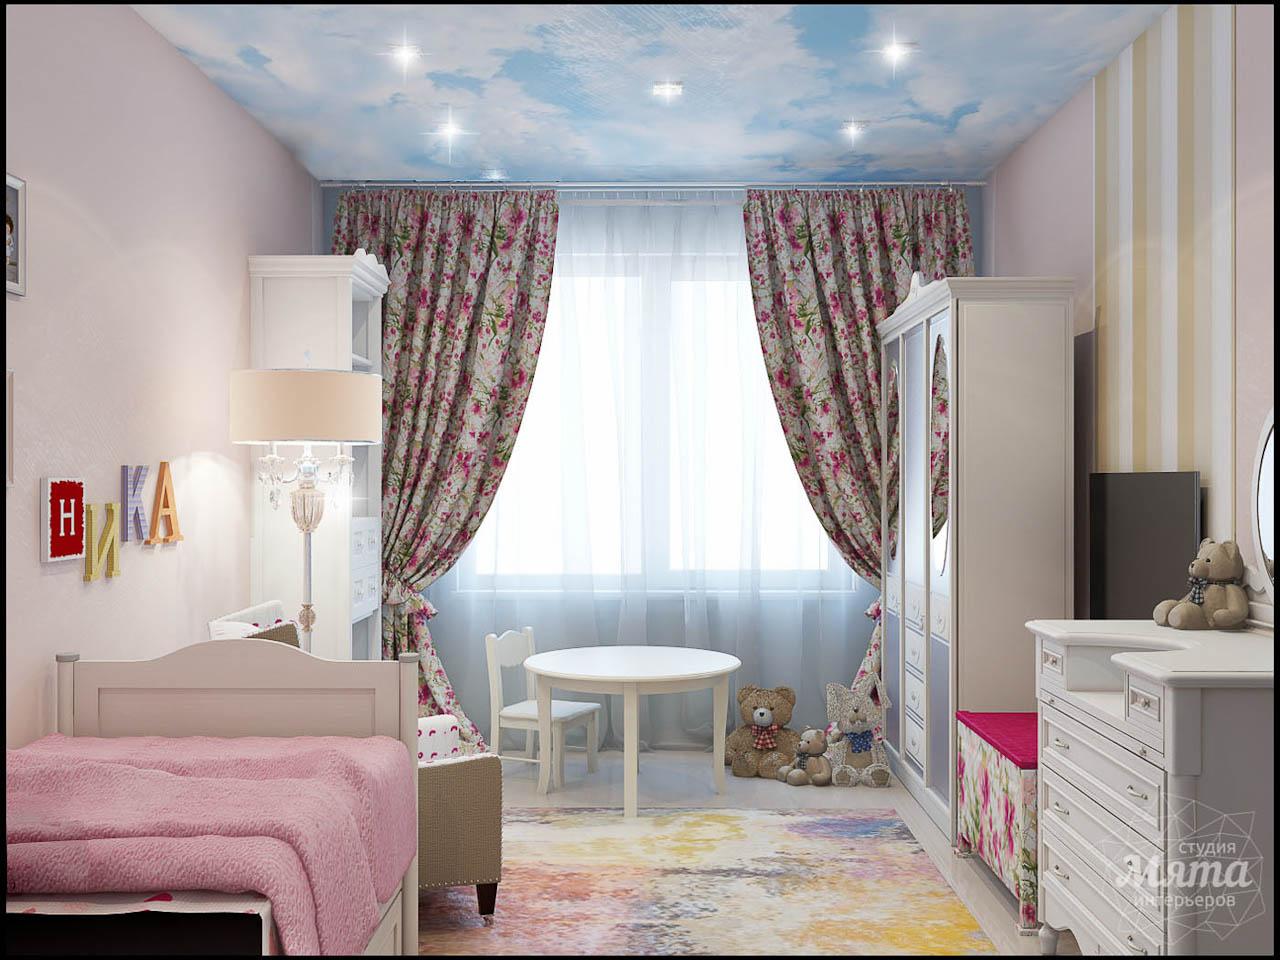 Дизайн интерьера и ремонт трехкомнатной квартиры по ул. 8 Марта 190 img1607033593